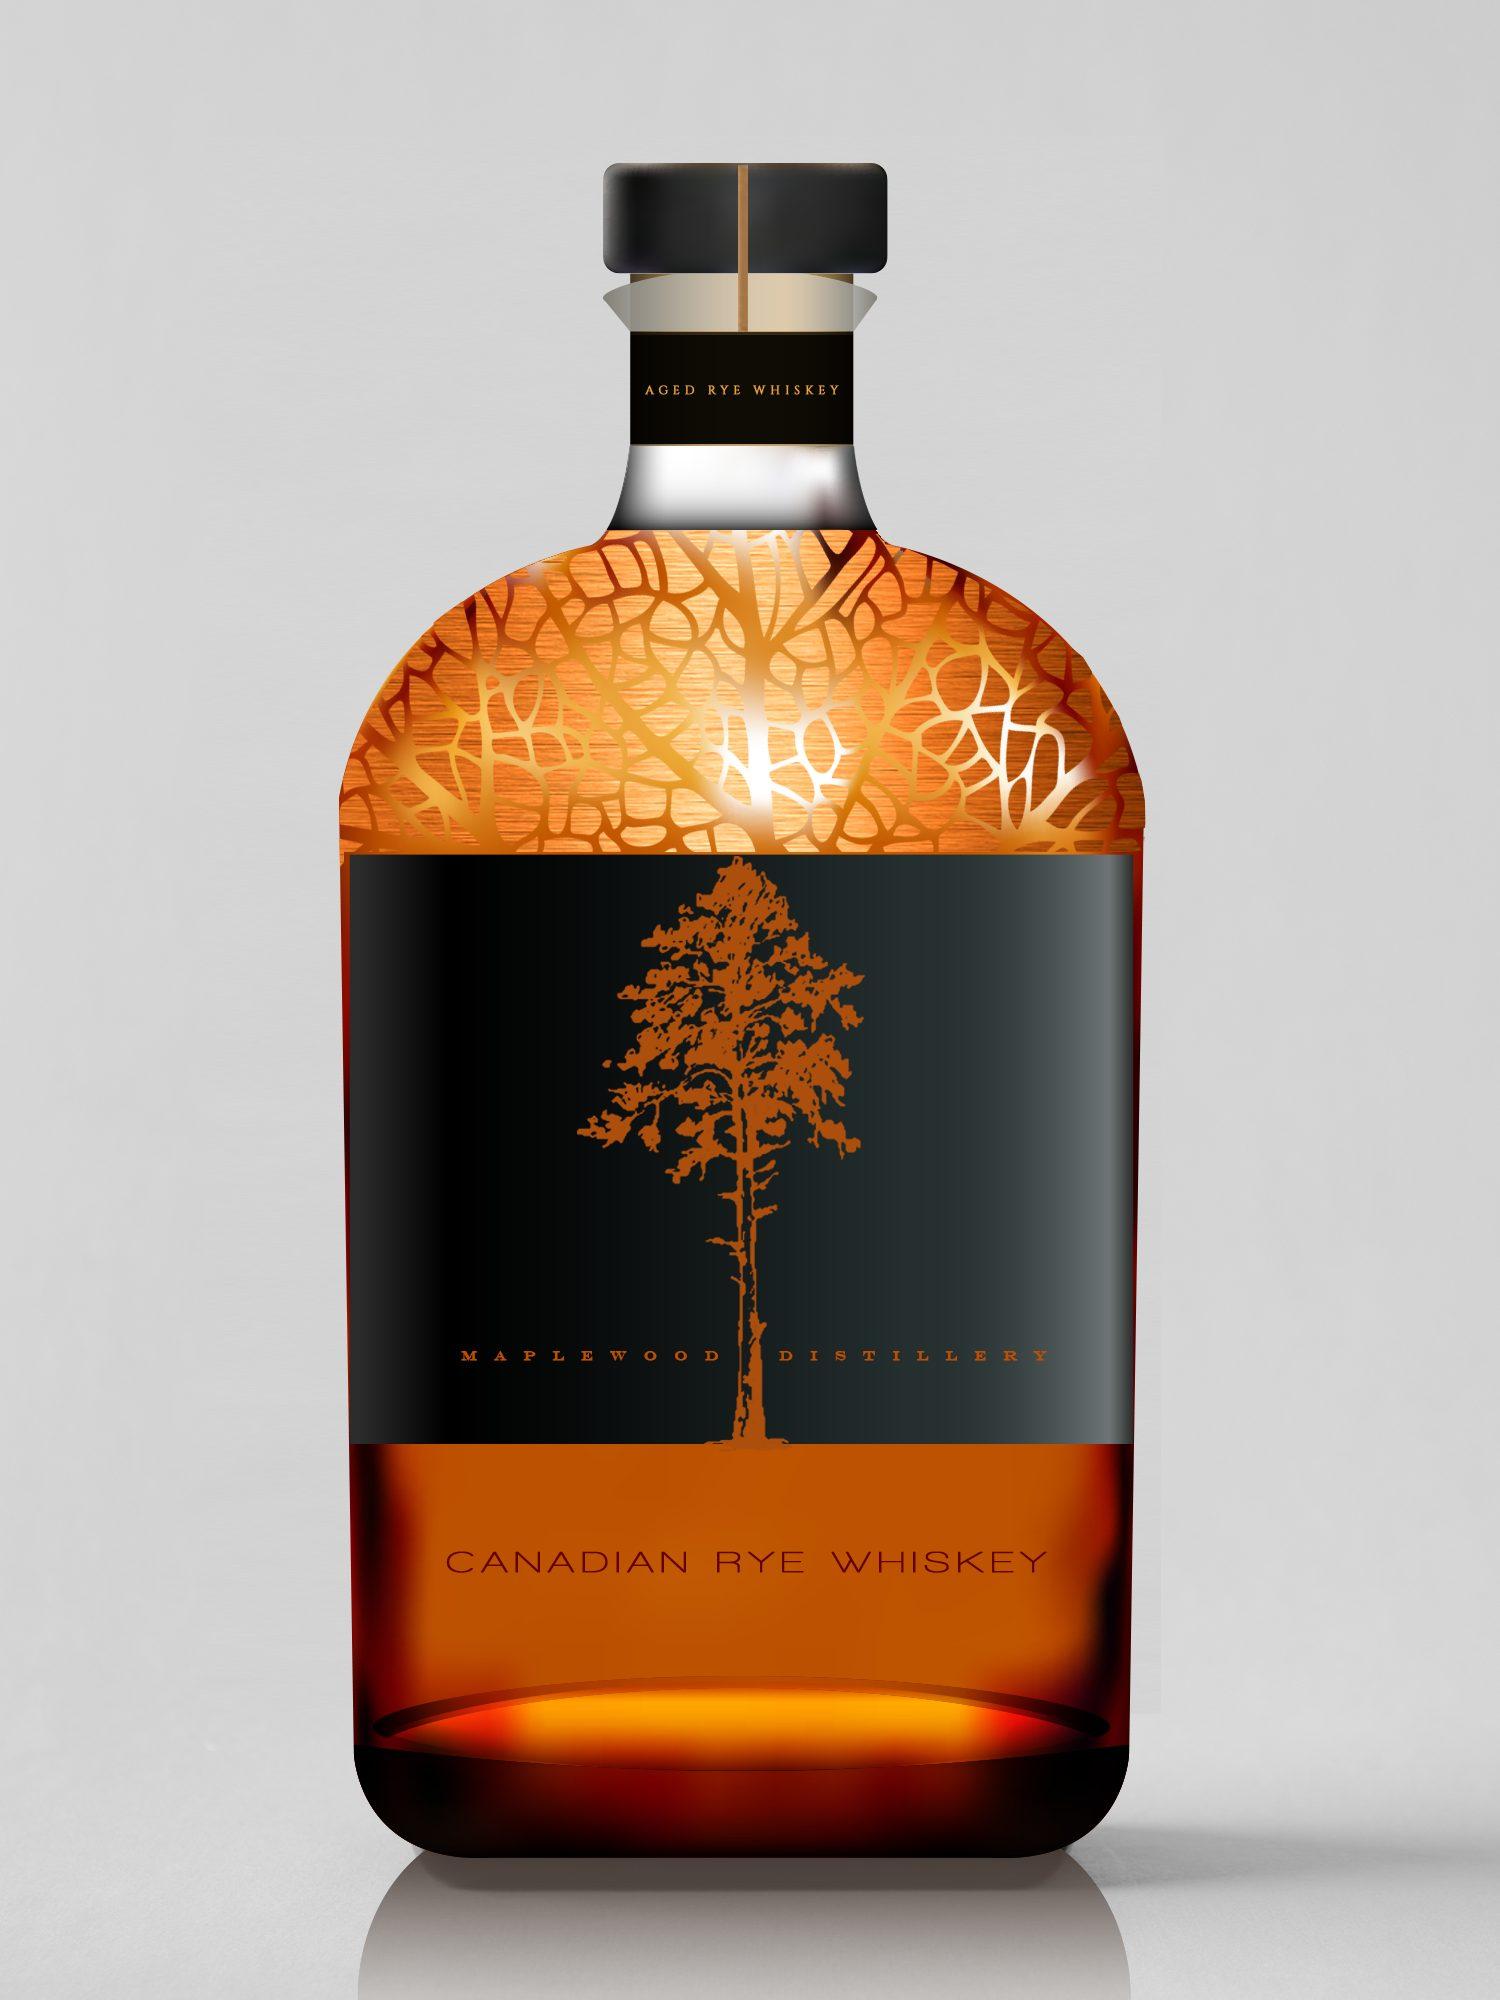 Oliver-Spence-Maplewood-Distillery-Brand-Bottle